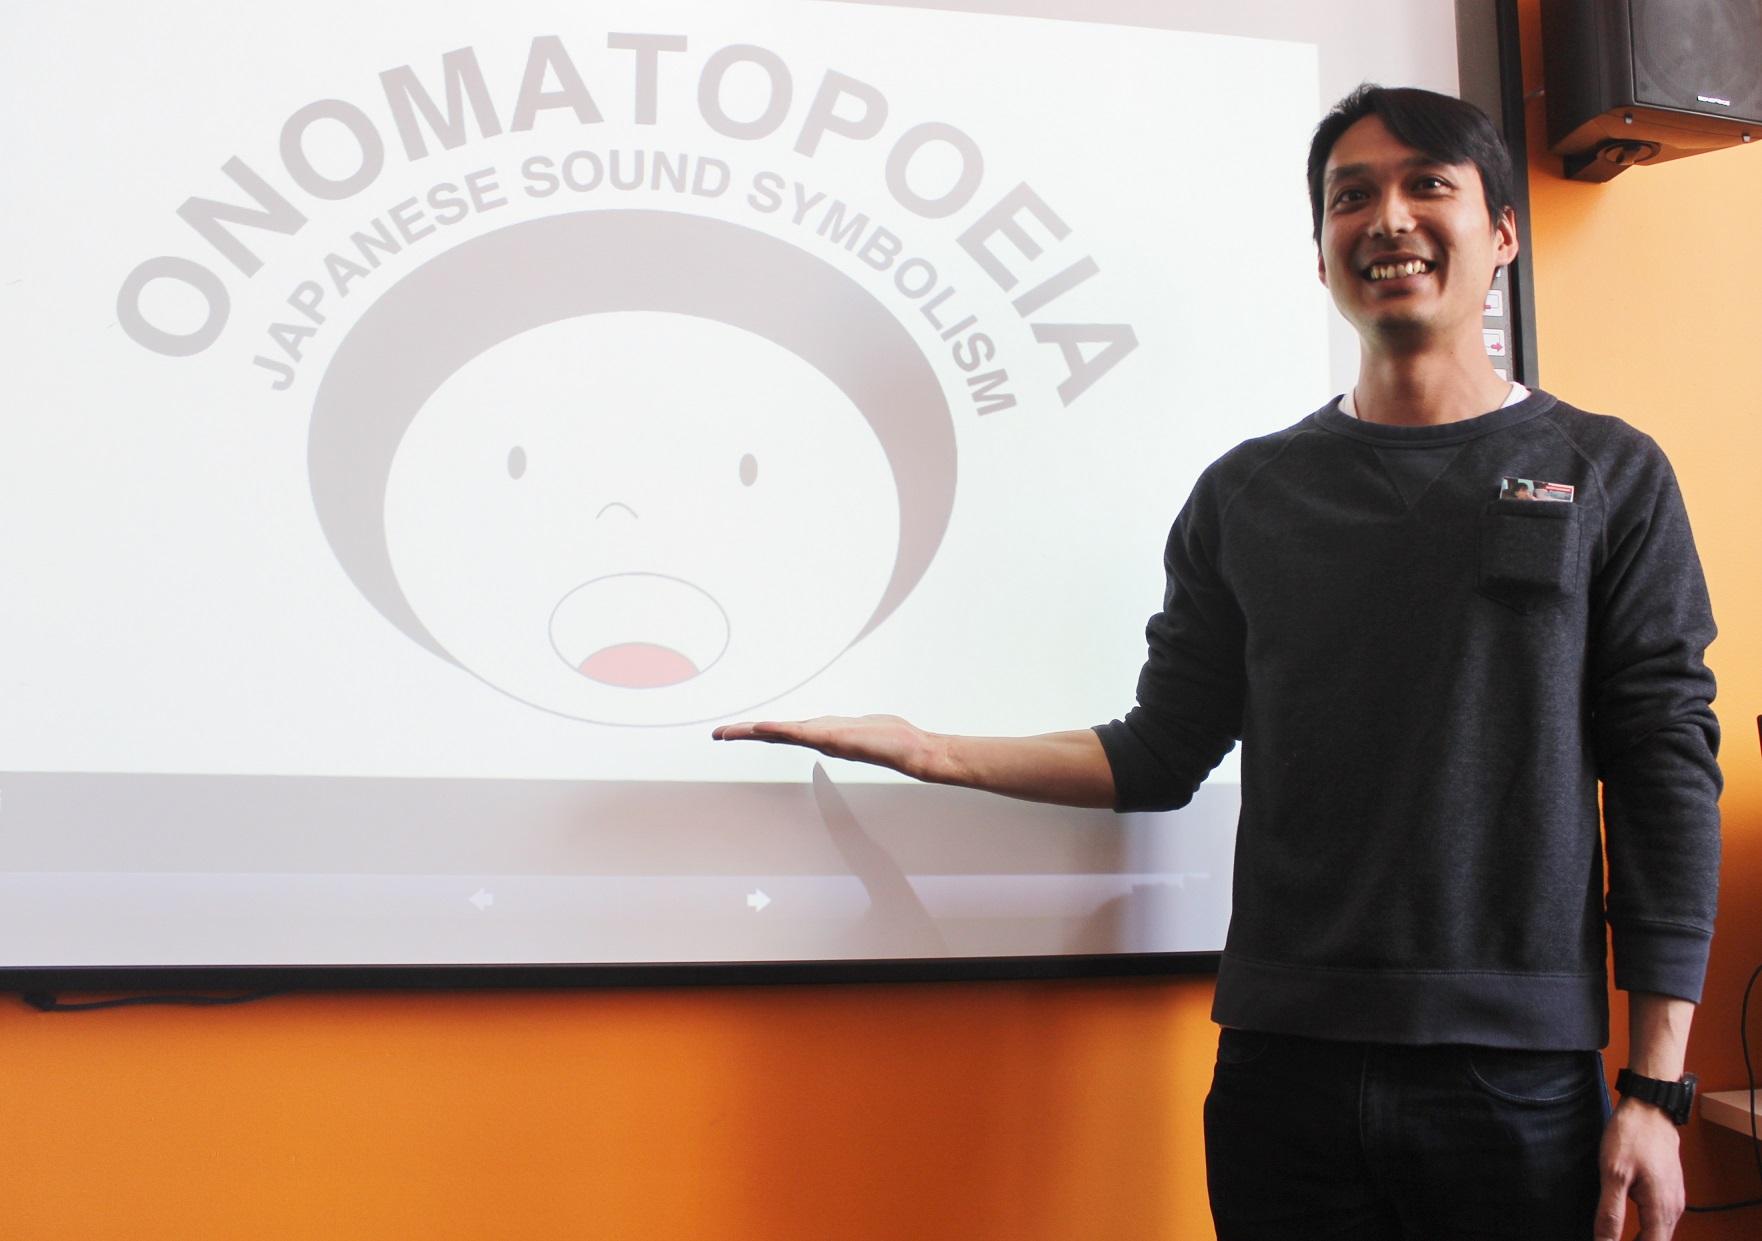 Yosuke Matoba From Japan Presents: Onomatopoeia, Japanese